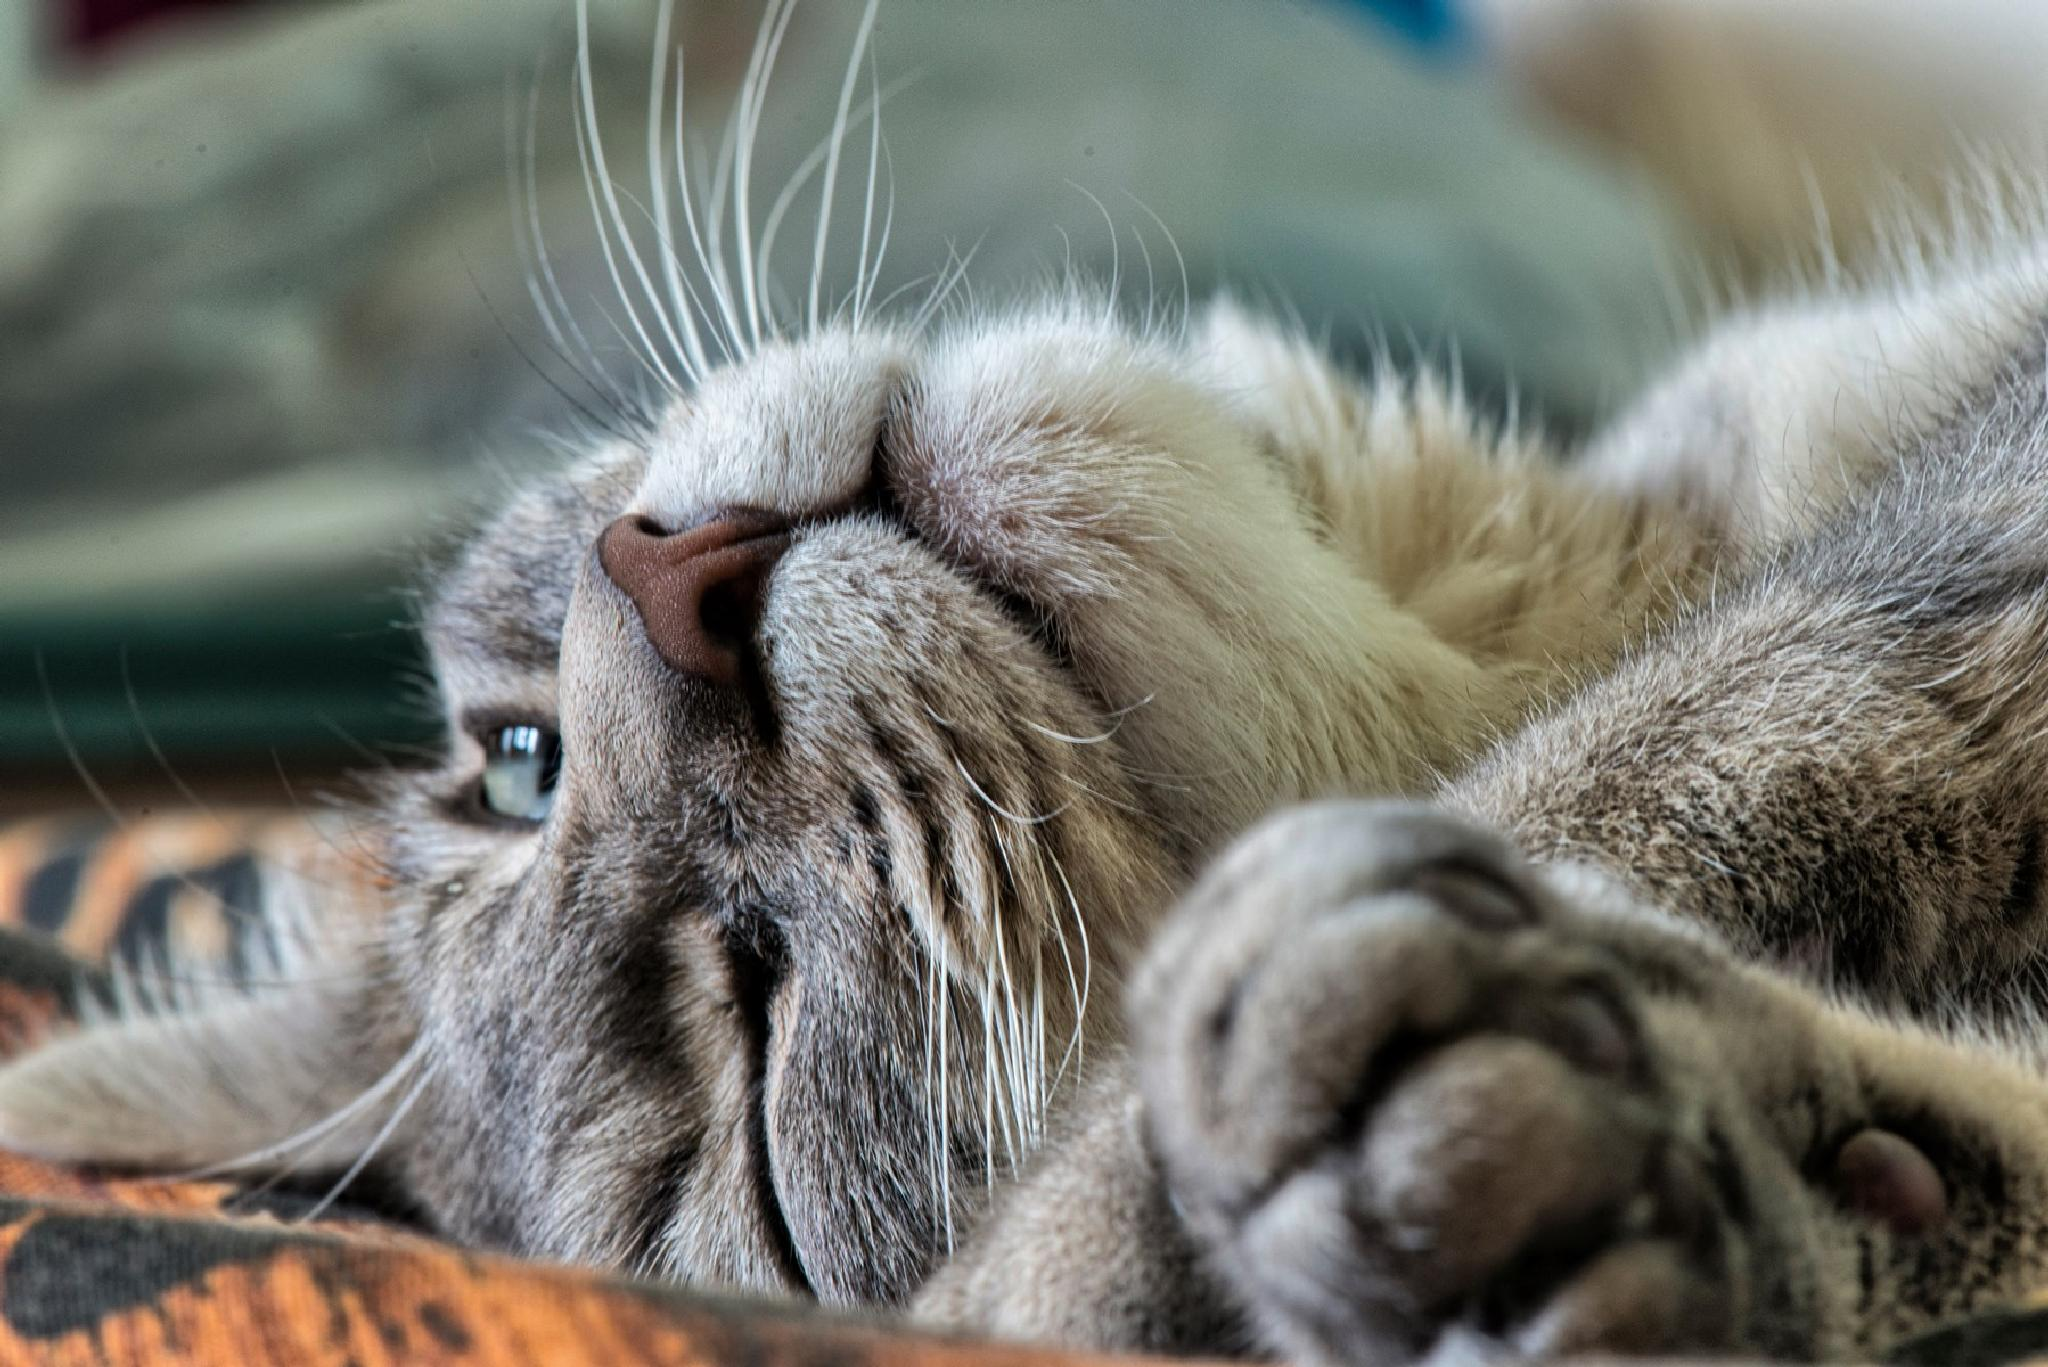 Simba the cat by dariosperone